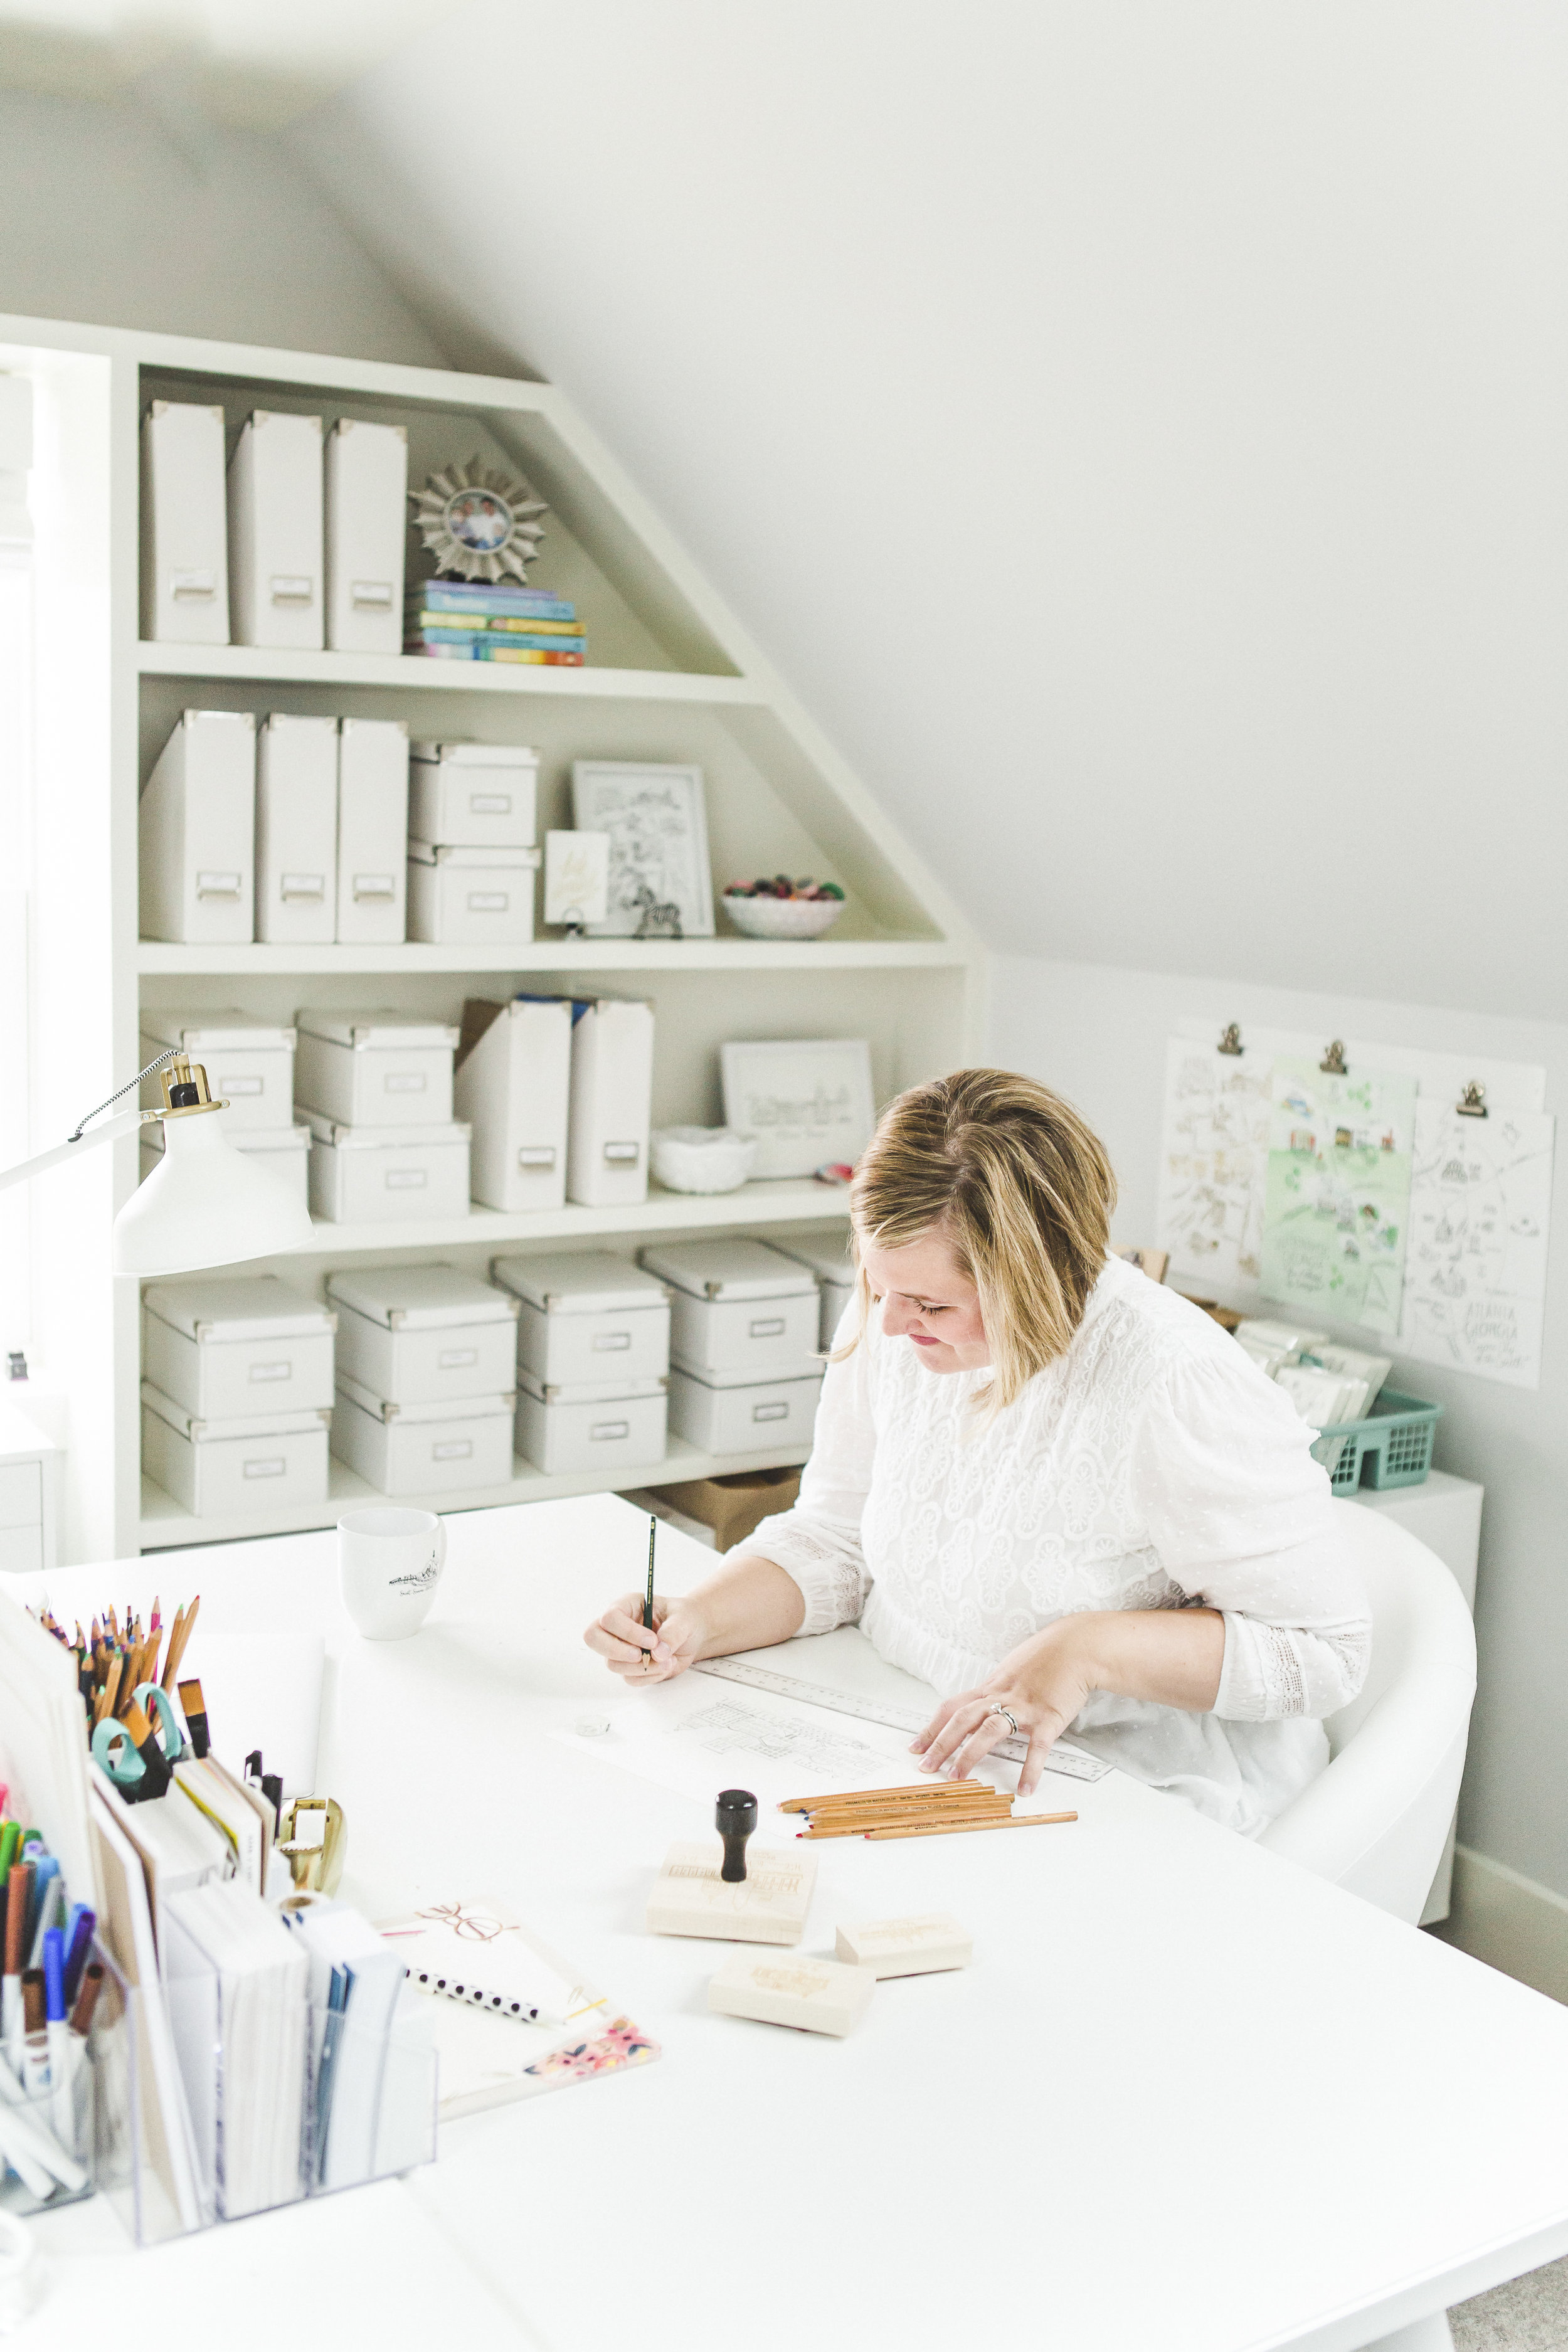 Natalie Kilgore   Natty Michelle Paperie   Athens, GA   Stationery   Illustrator   Maker   Artist Studio   Paper Goods